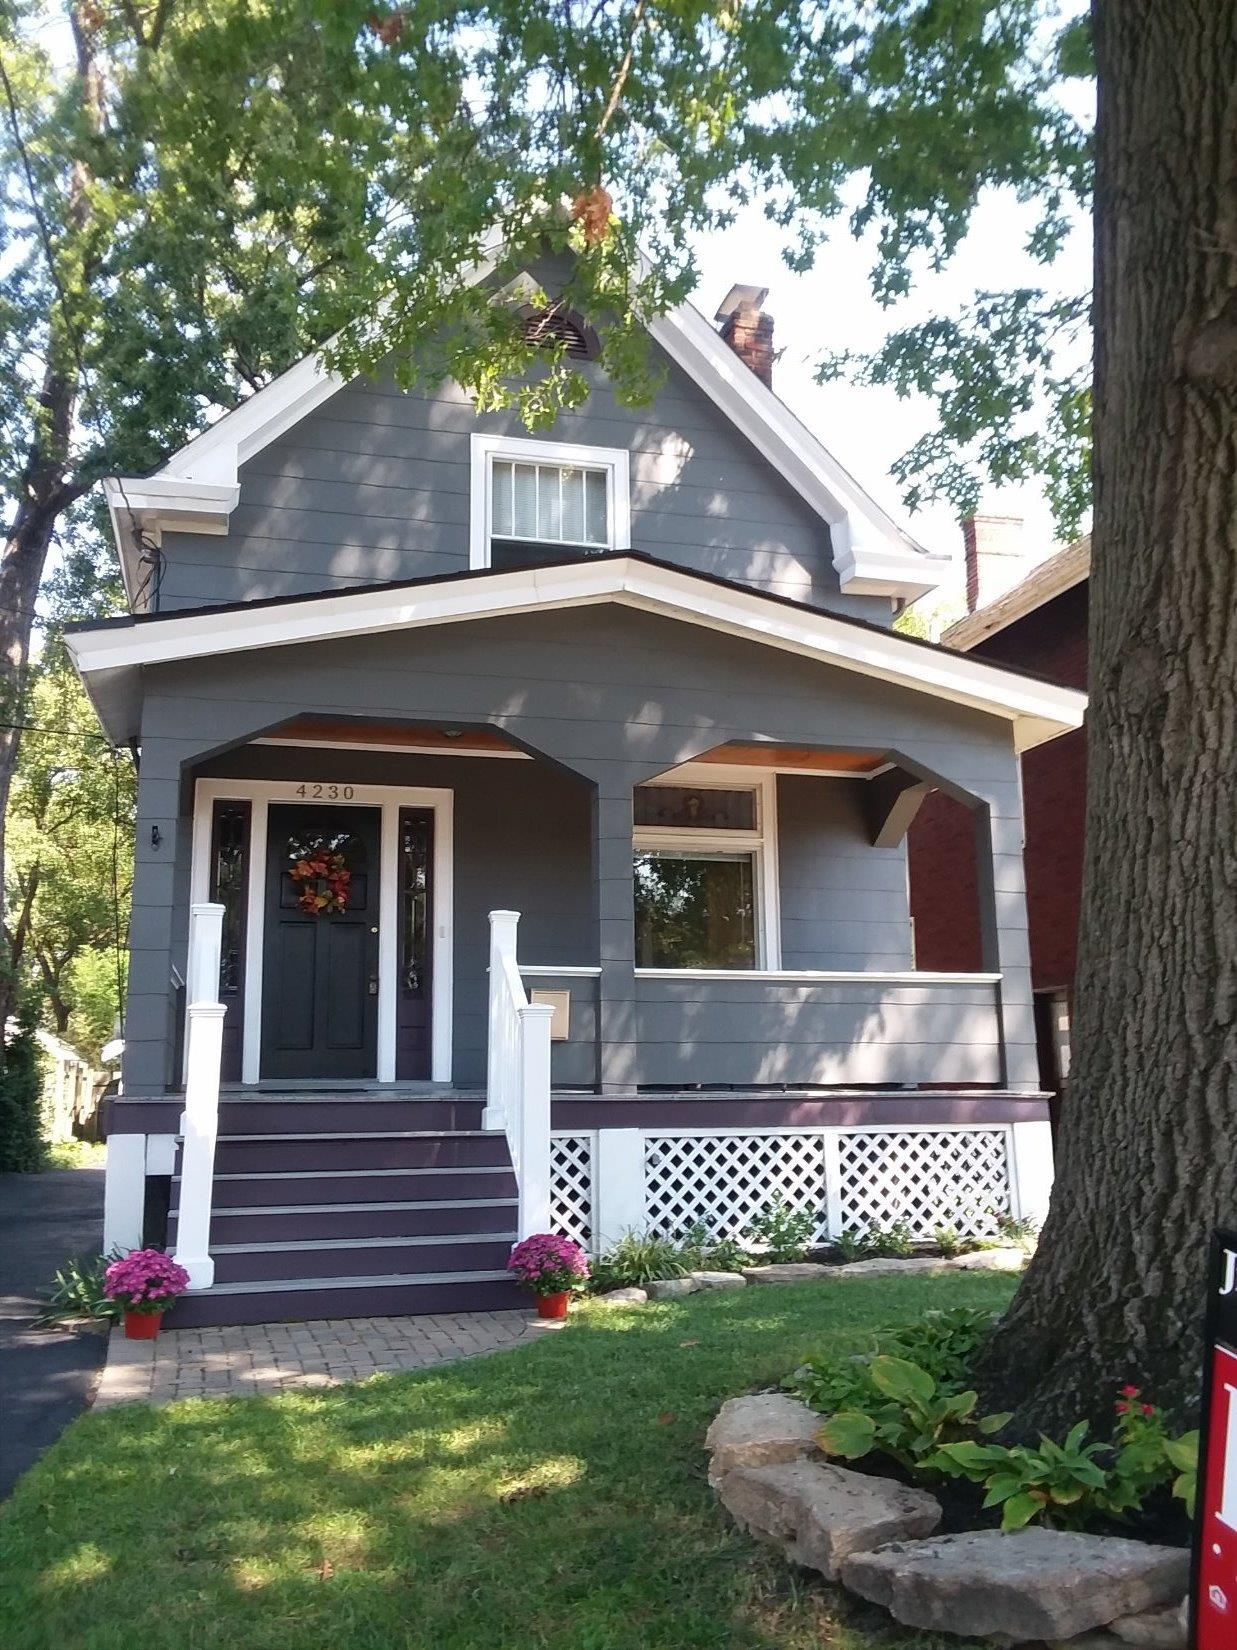 Property for sale at 4230 Brownway Avenue, Cincinnati,  OH 45209